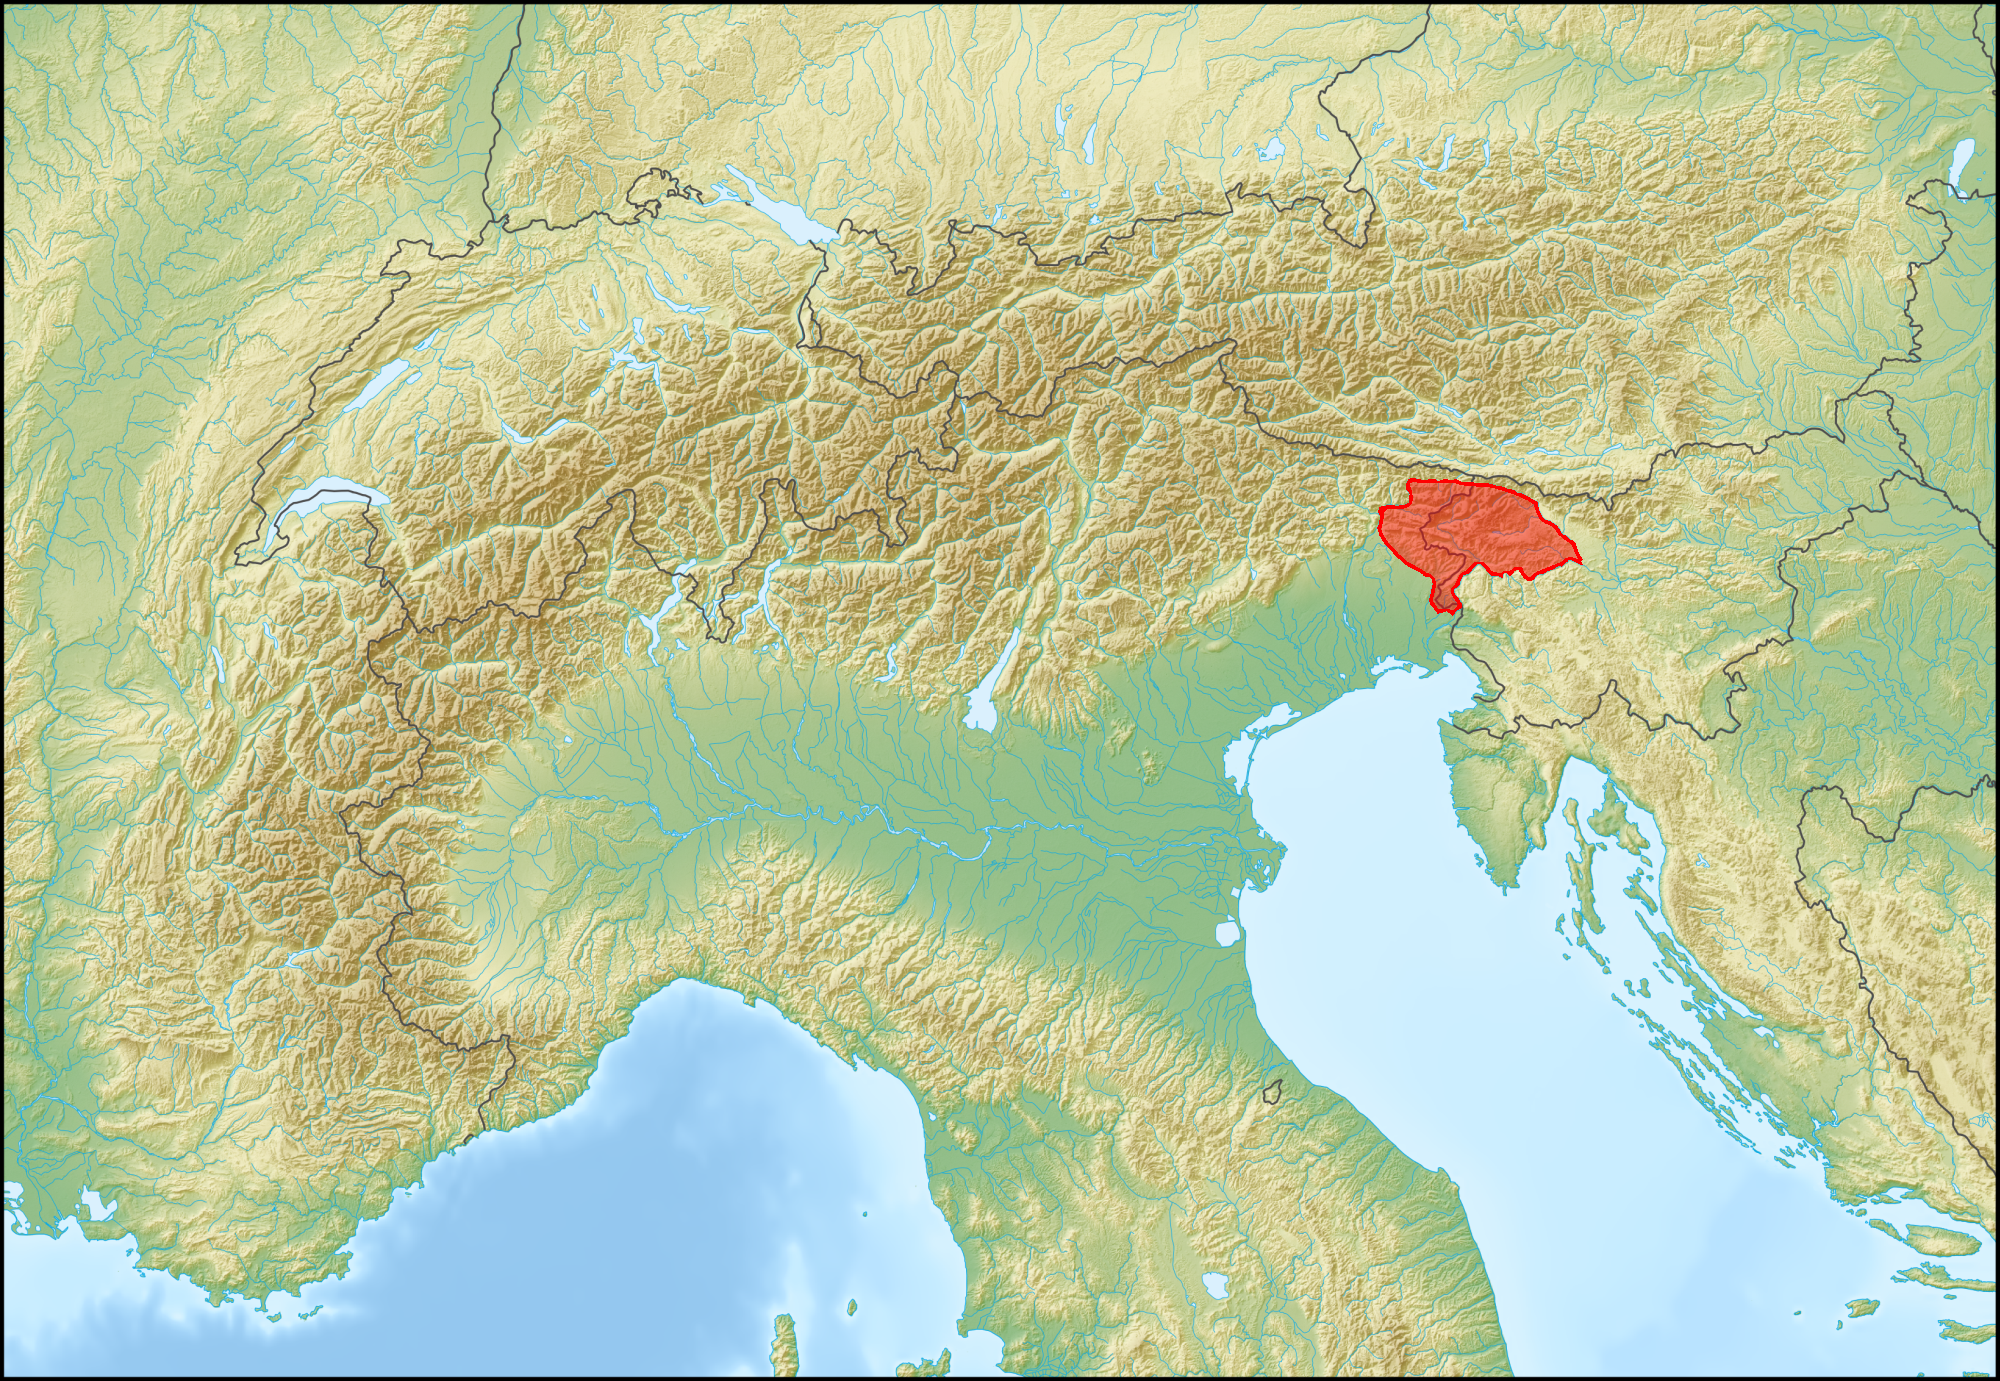 File:Alps location map (Julijske Alpe).png - Wikimedia Commons